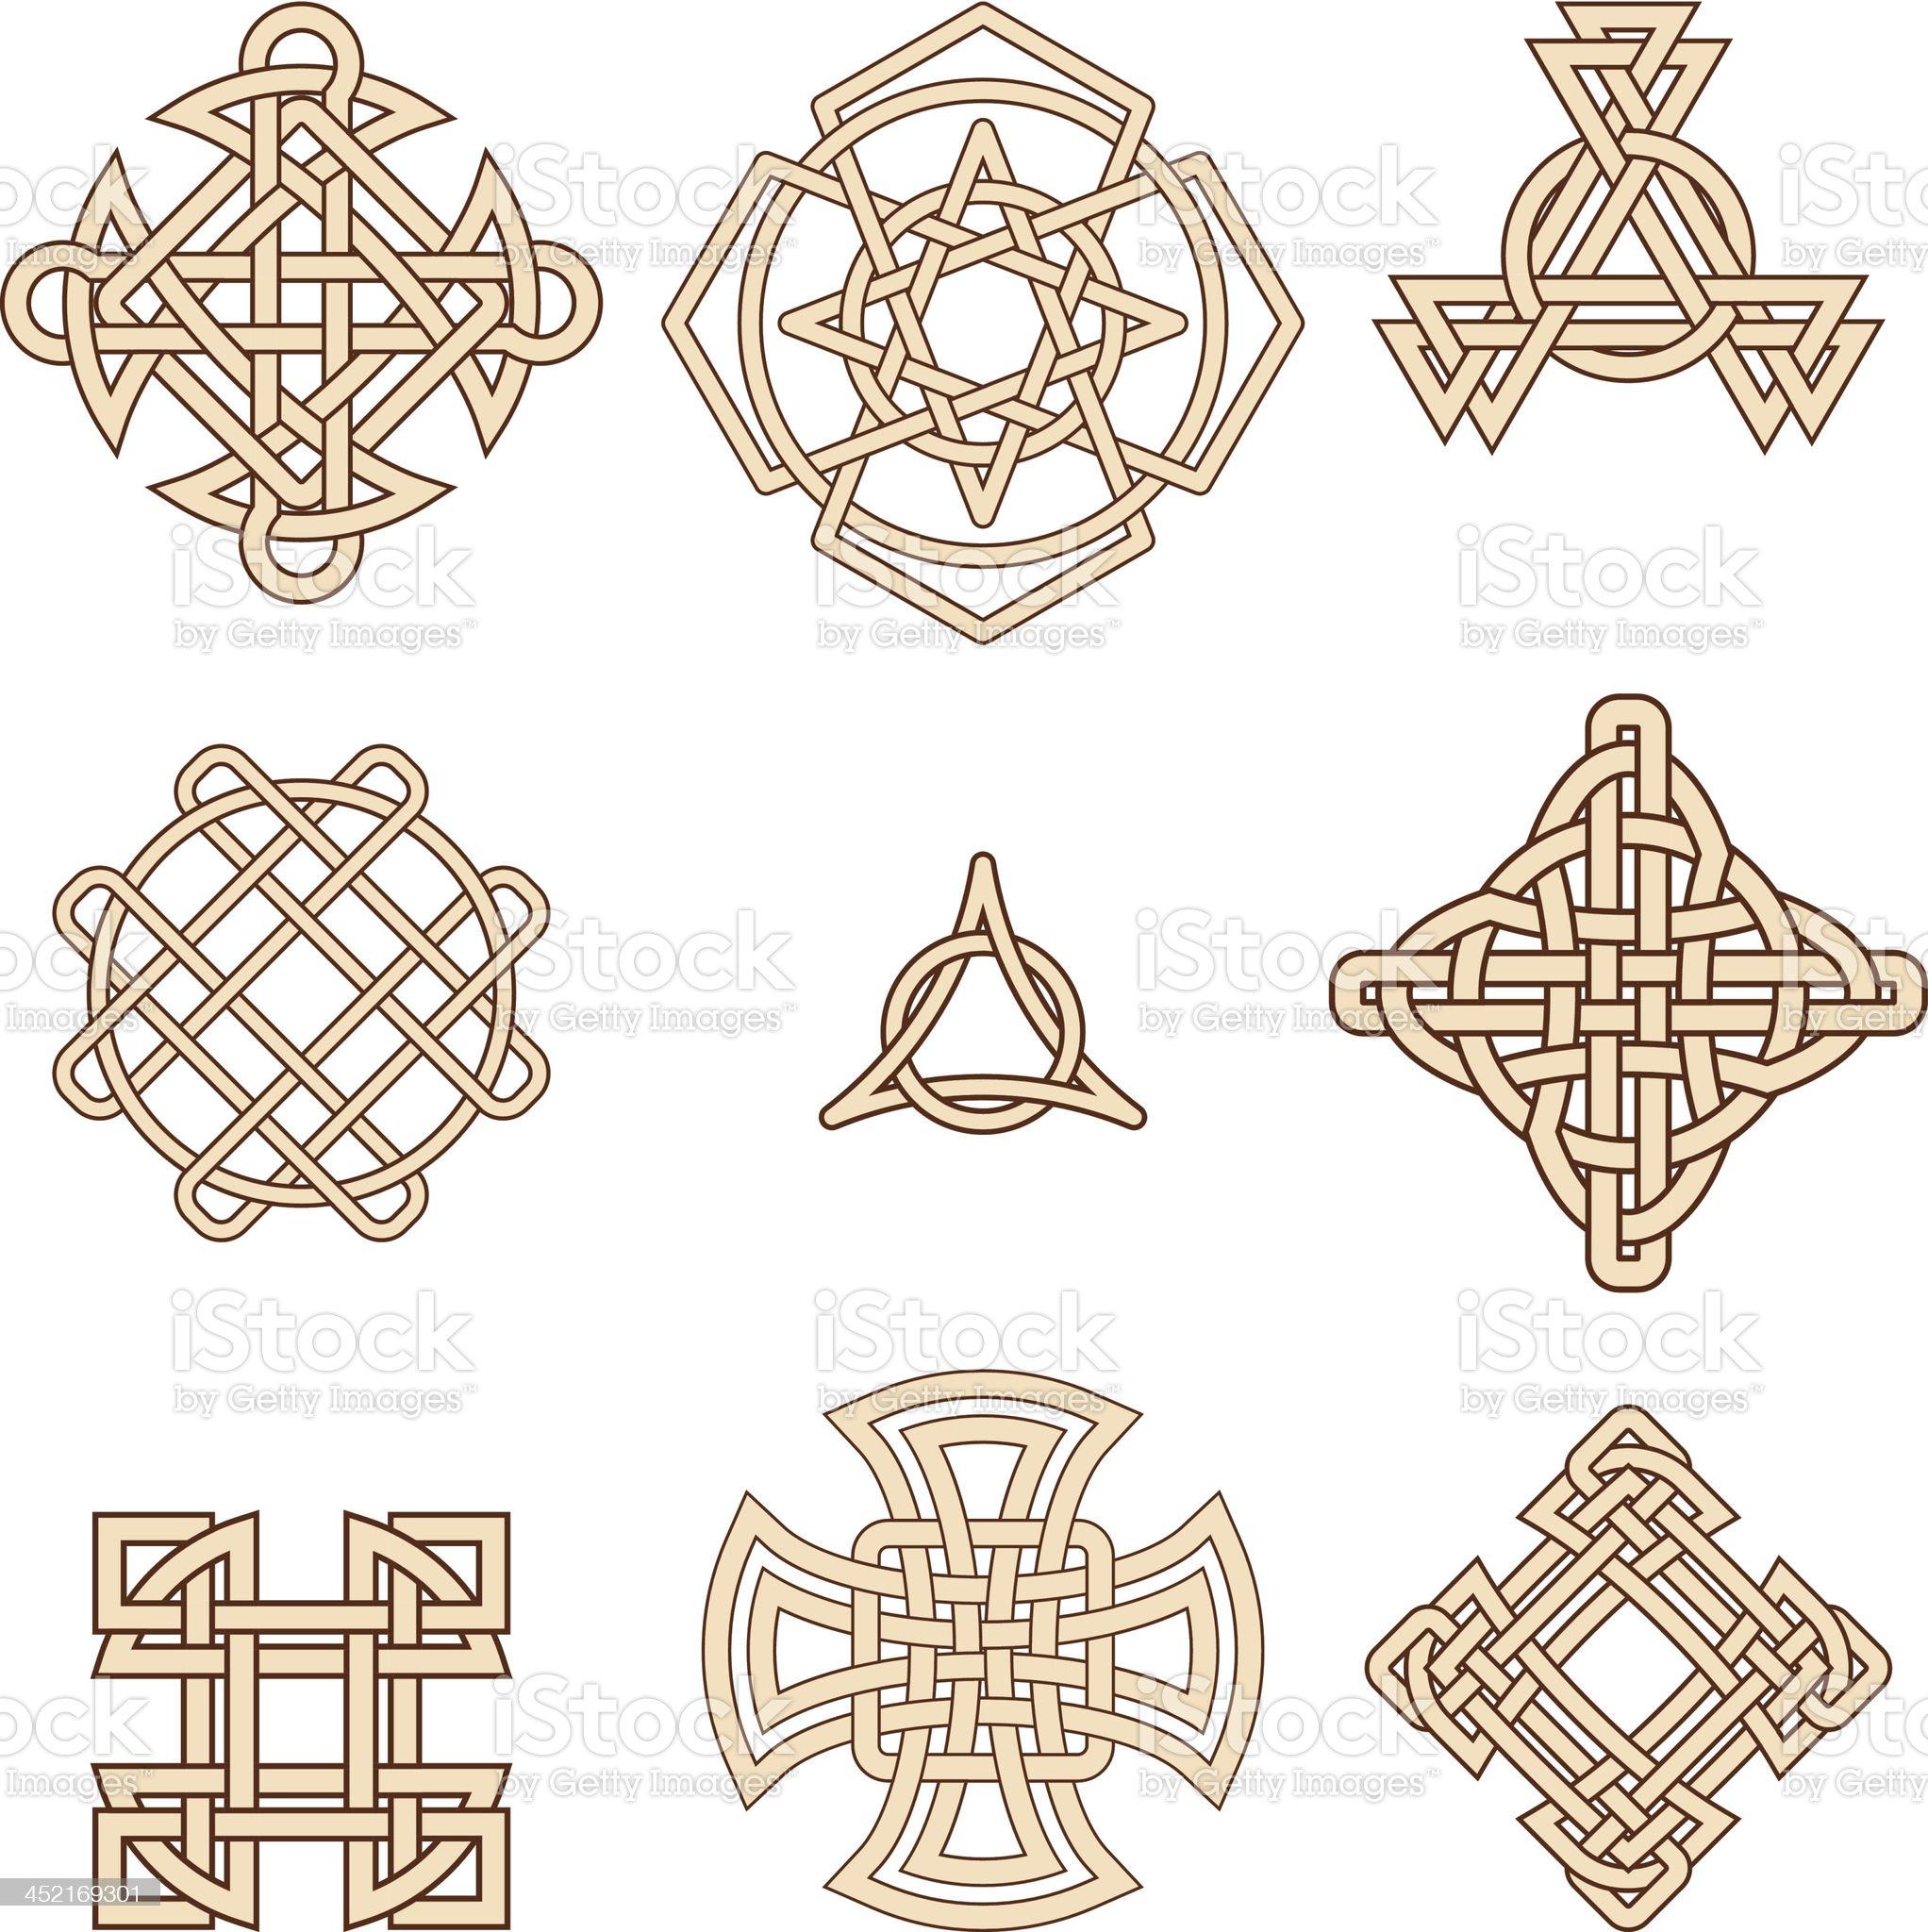 celtic symbols royalty-free stock vector art